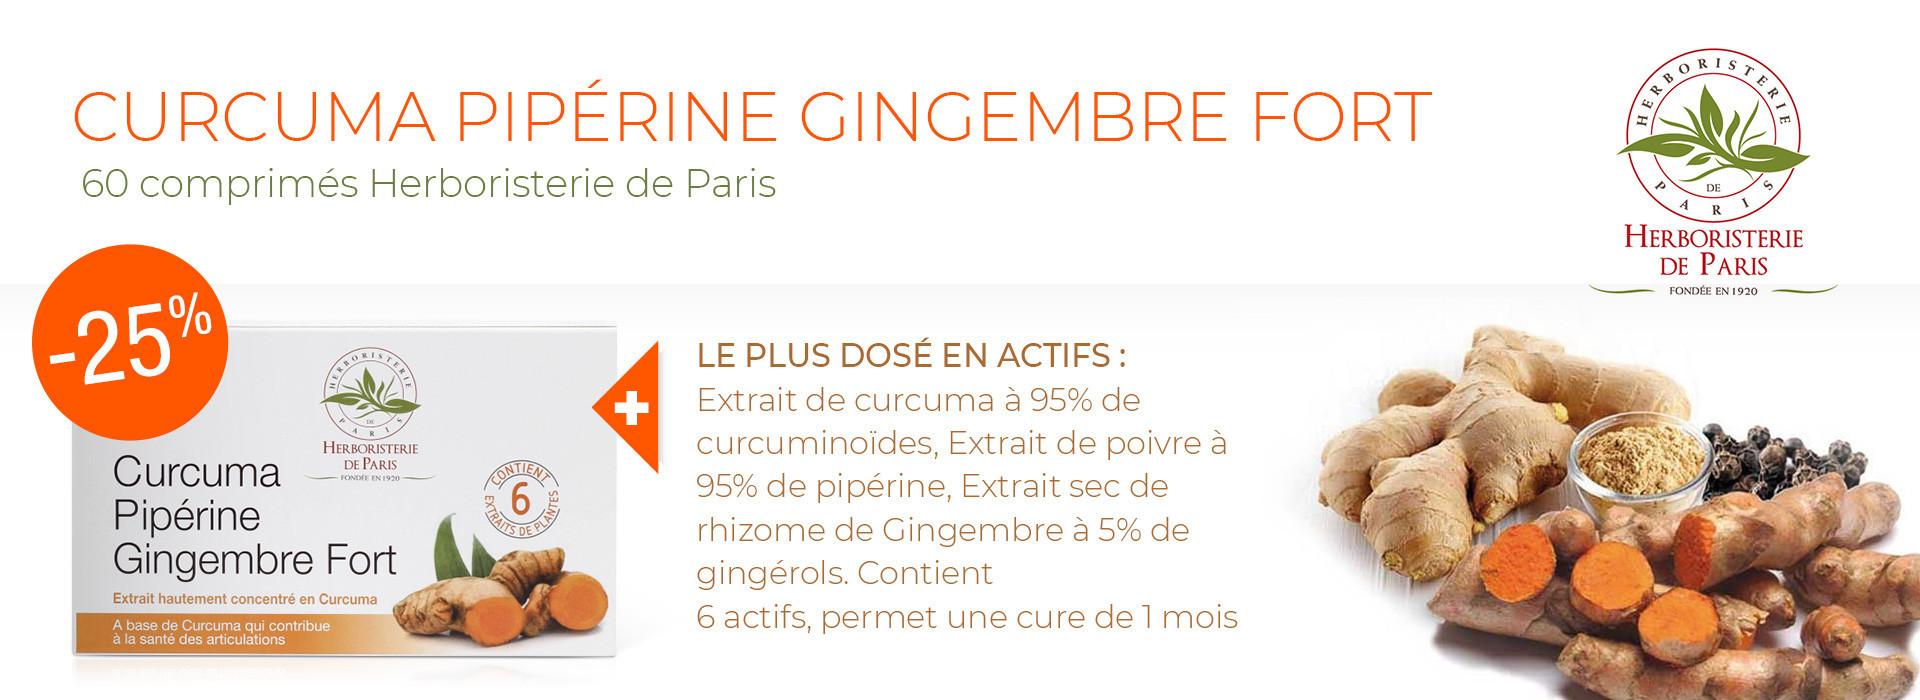 curcuma pipérine gingembre